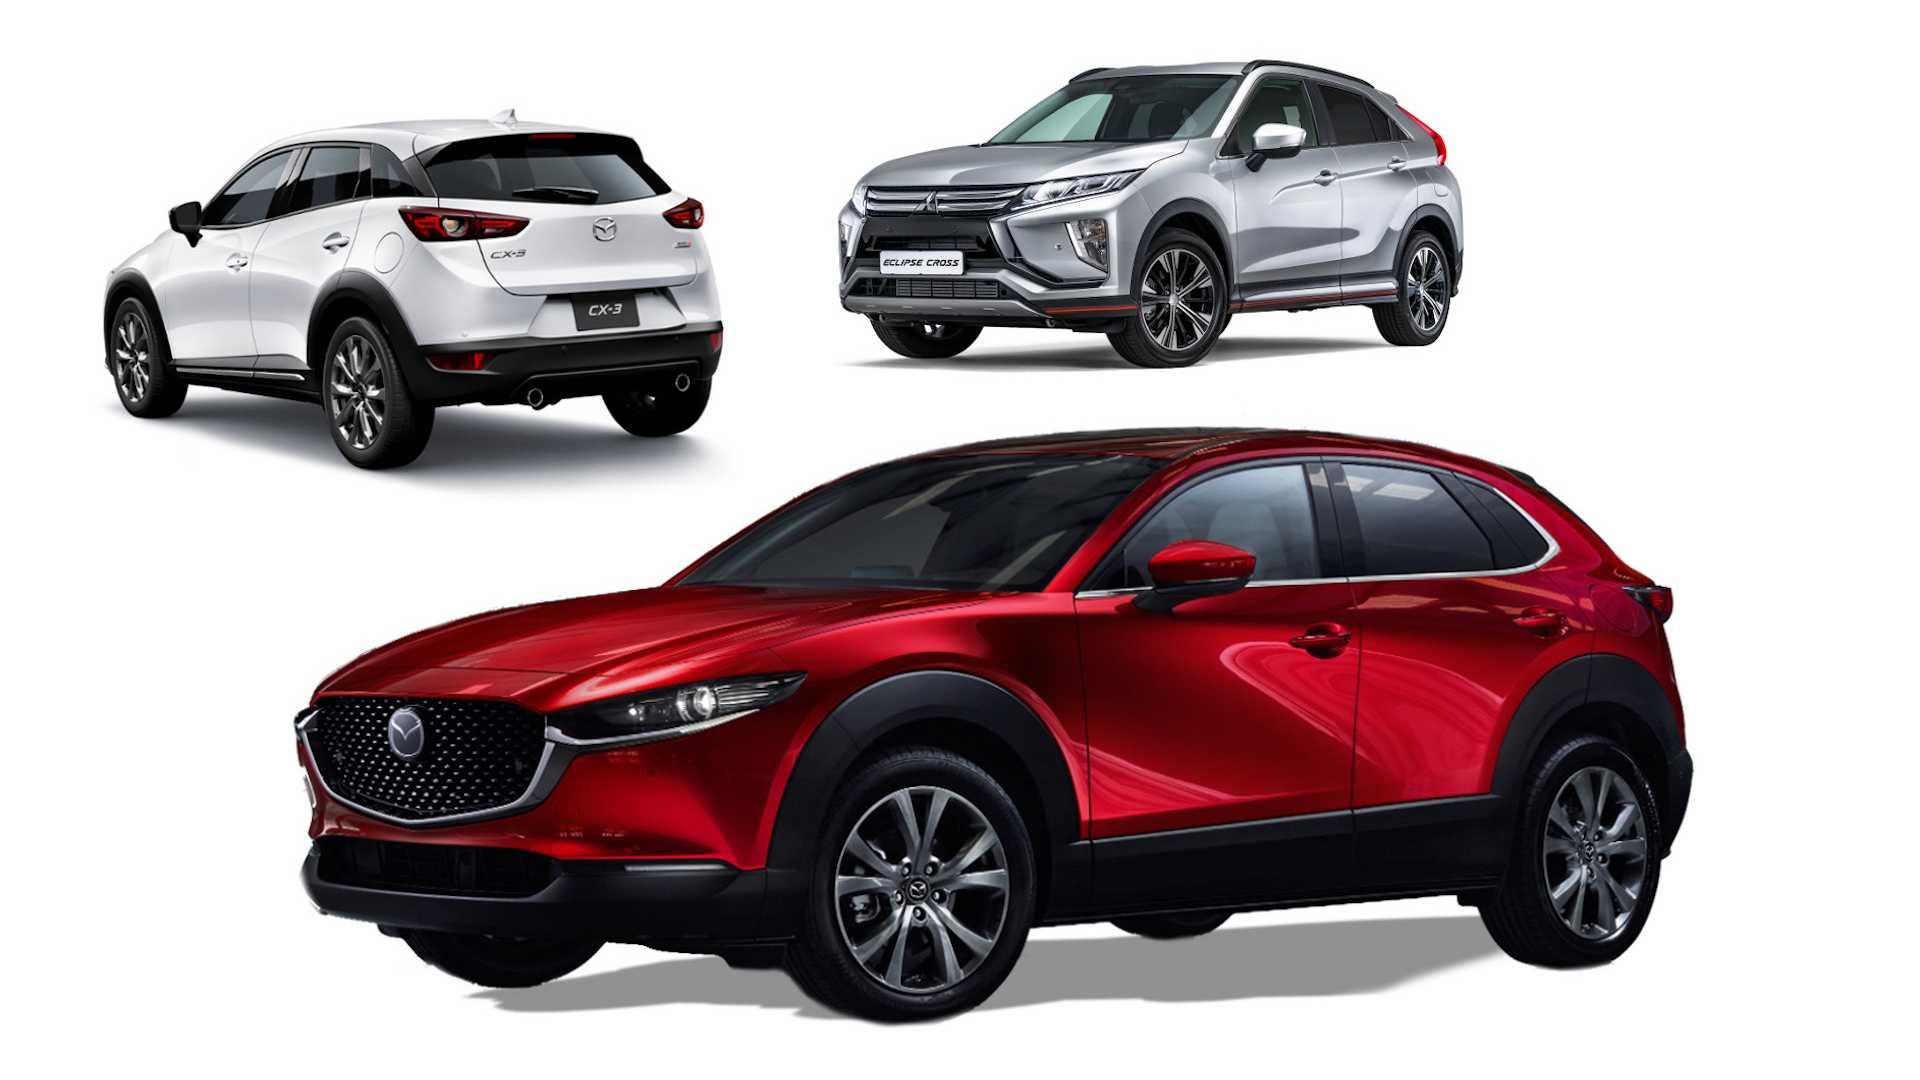 93 Concept of 2020 Mazda Cx 30 Price Concept for 2020 Mazda Cx 30 Price